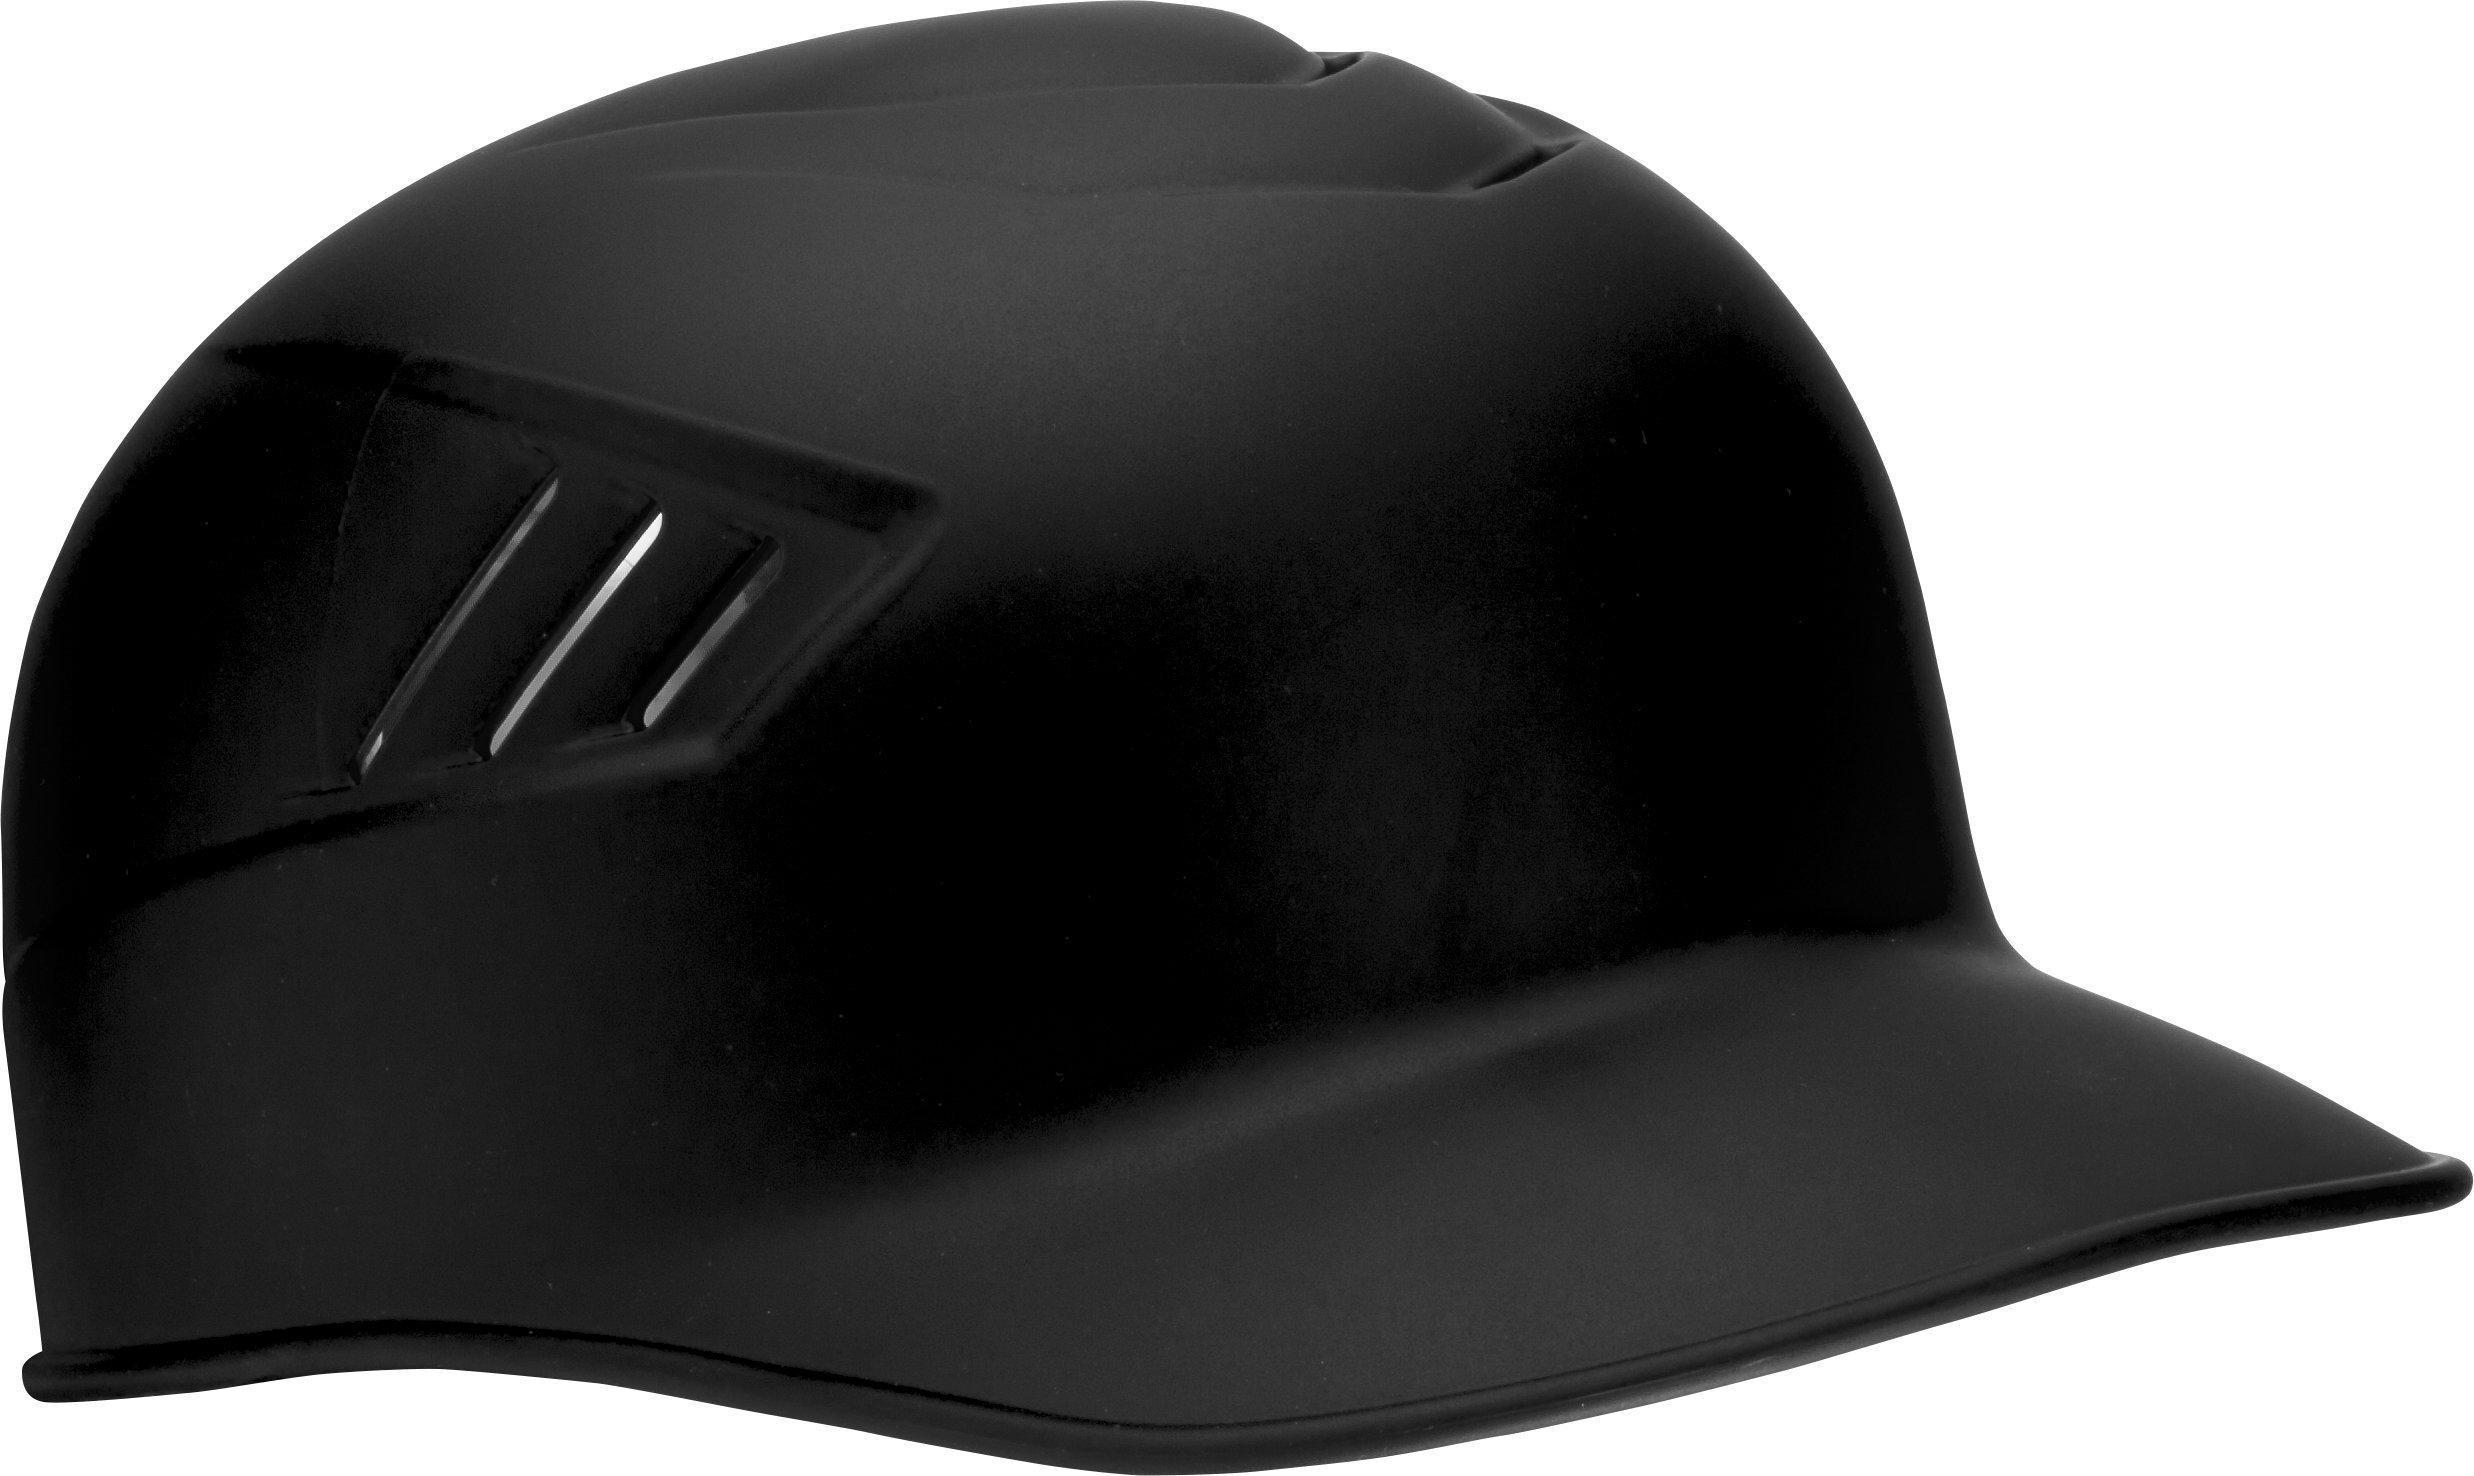 Rawlings Coolflo Matte Style Alpha Sized Base Coach Helmet, Black, Medium by Rawlings